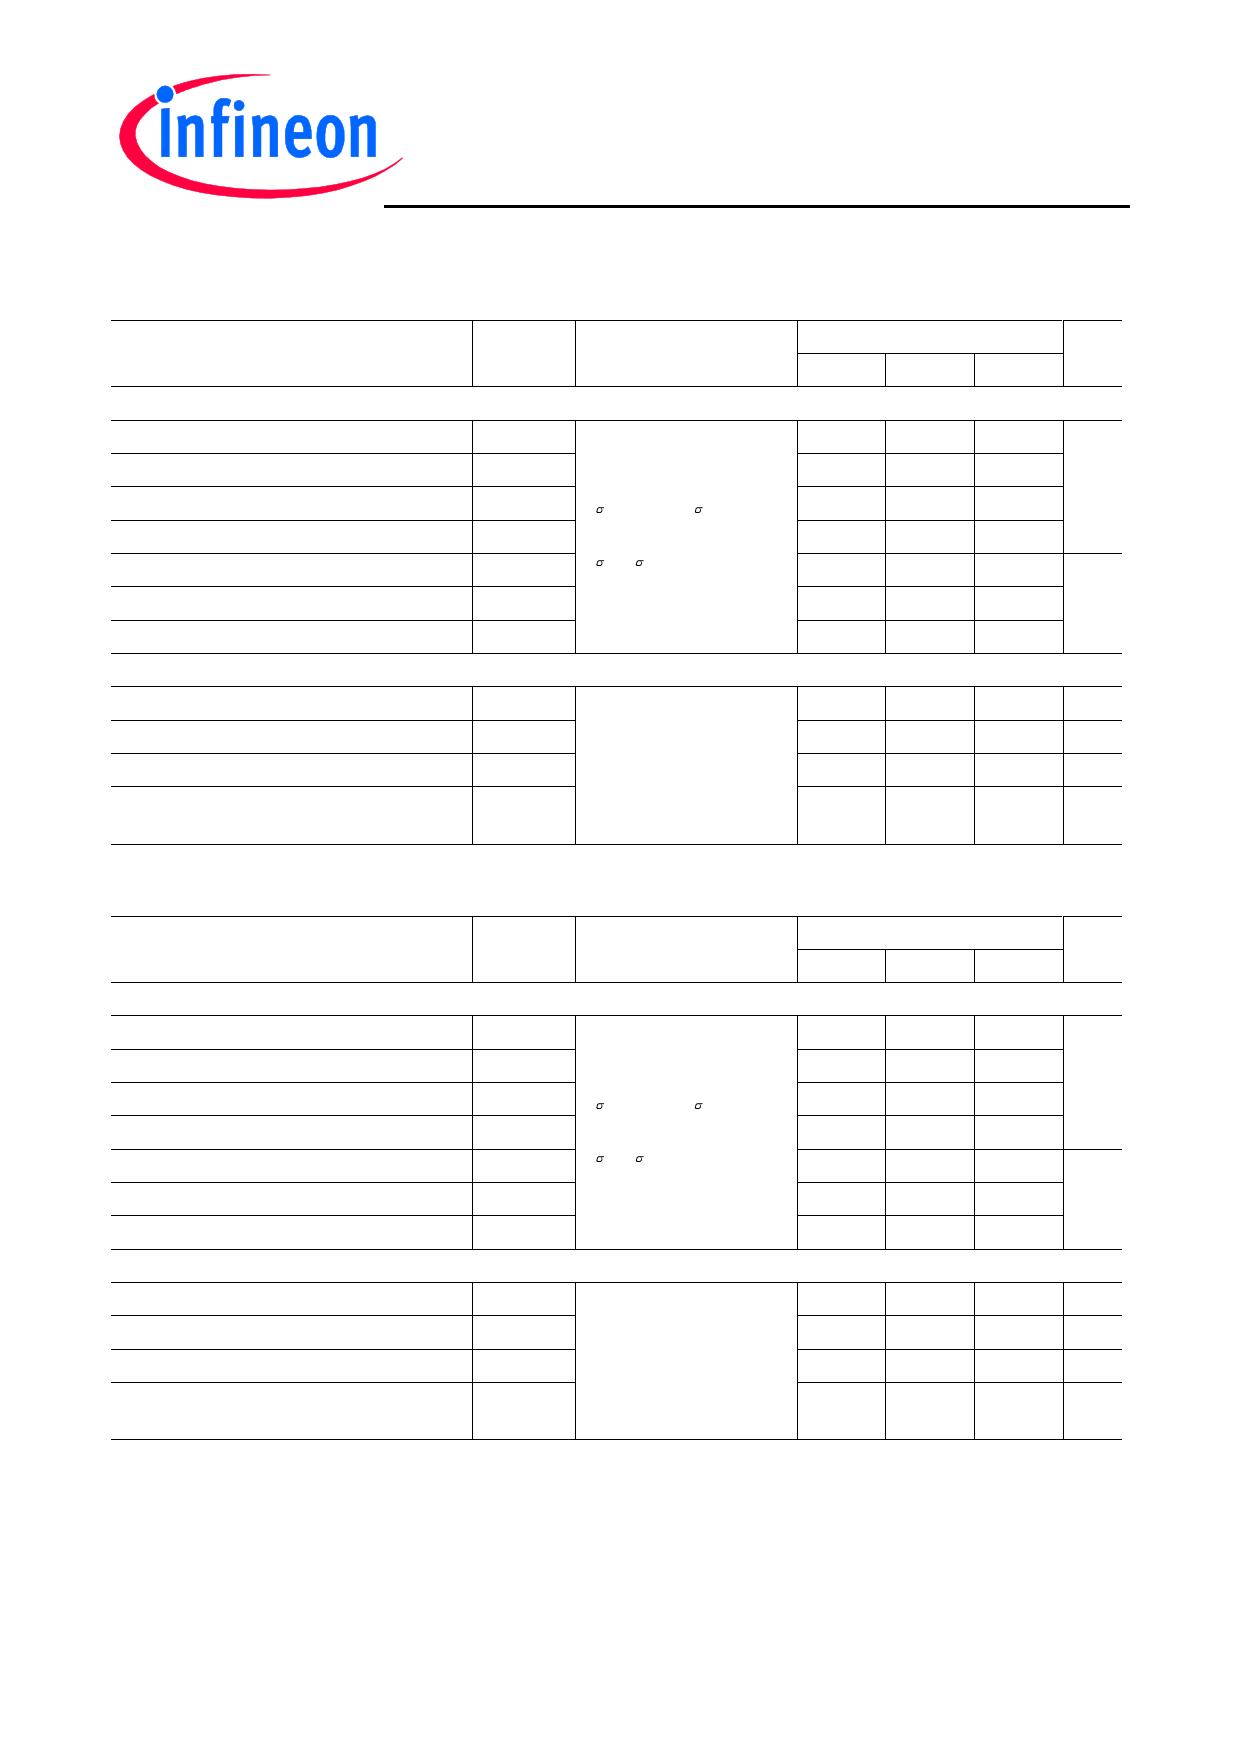 IKP06N60T pdf, ピン配列